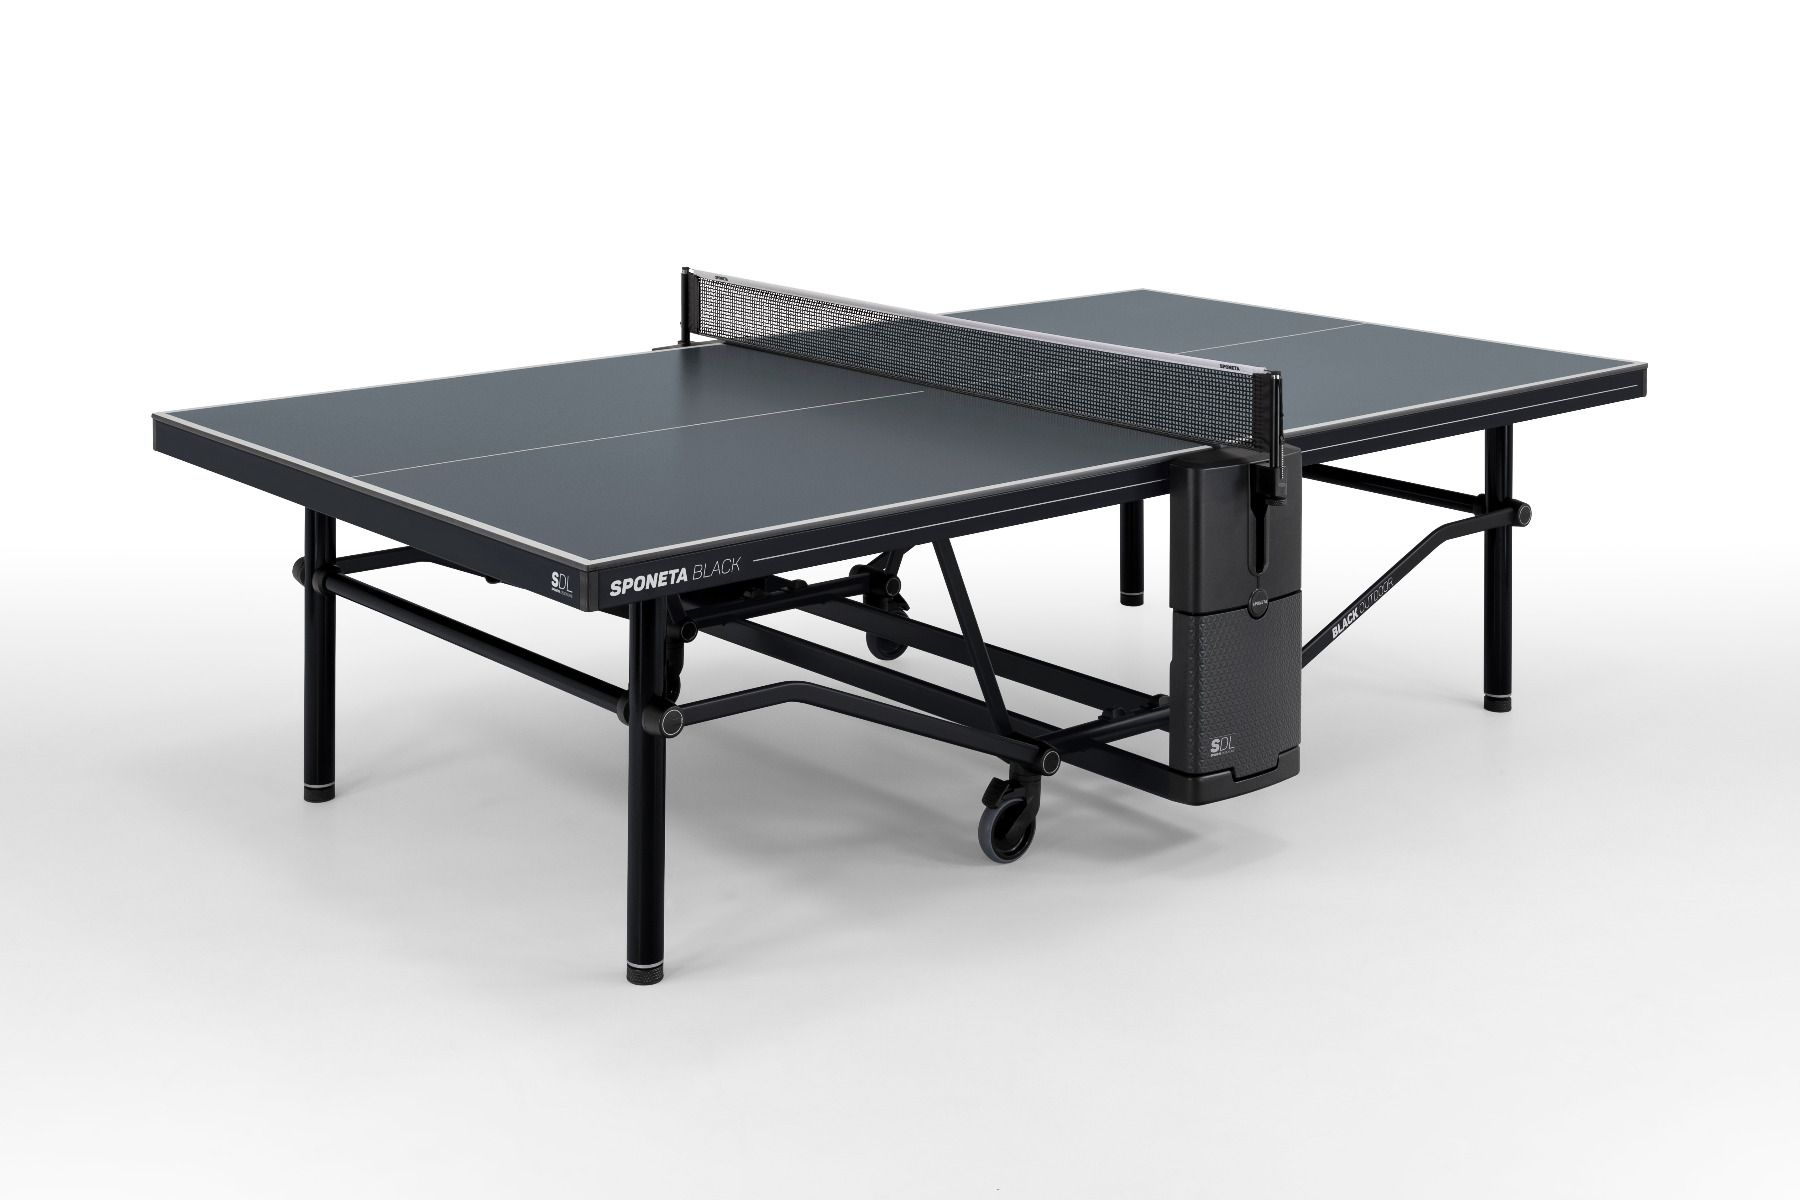 Pingpongový stůl venkovní SPONETA Design Line - Black Outdoor - venkovní